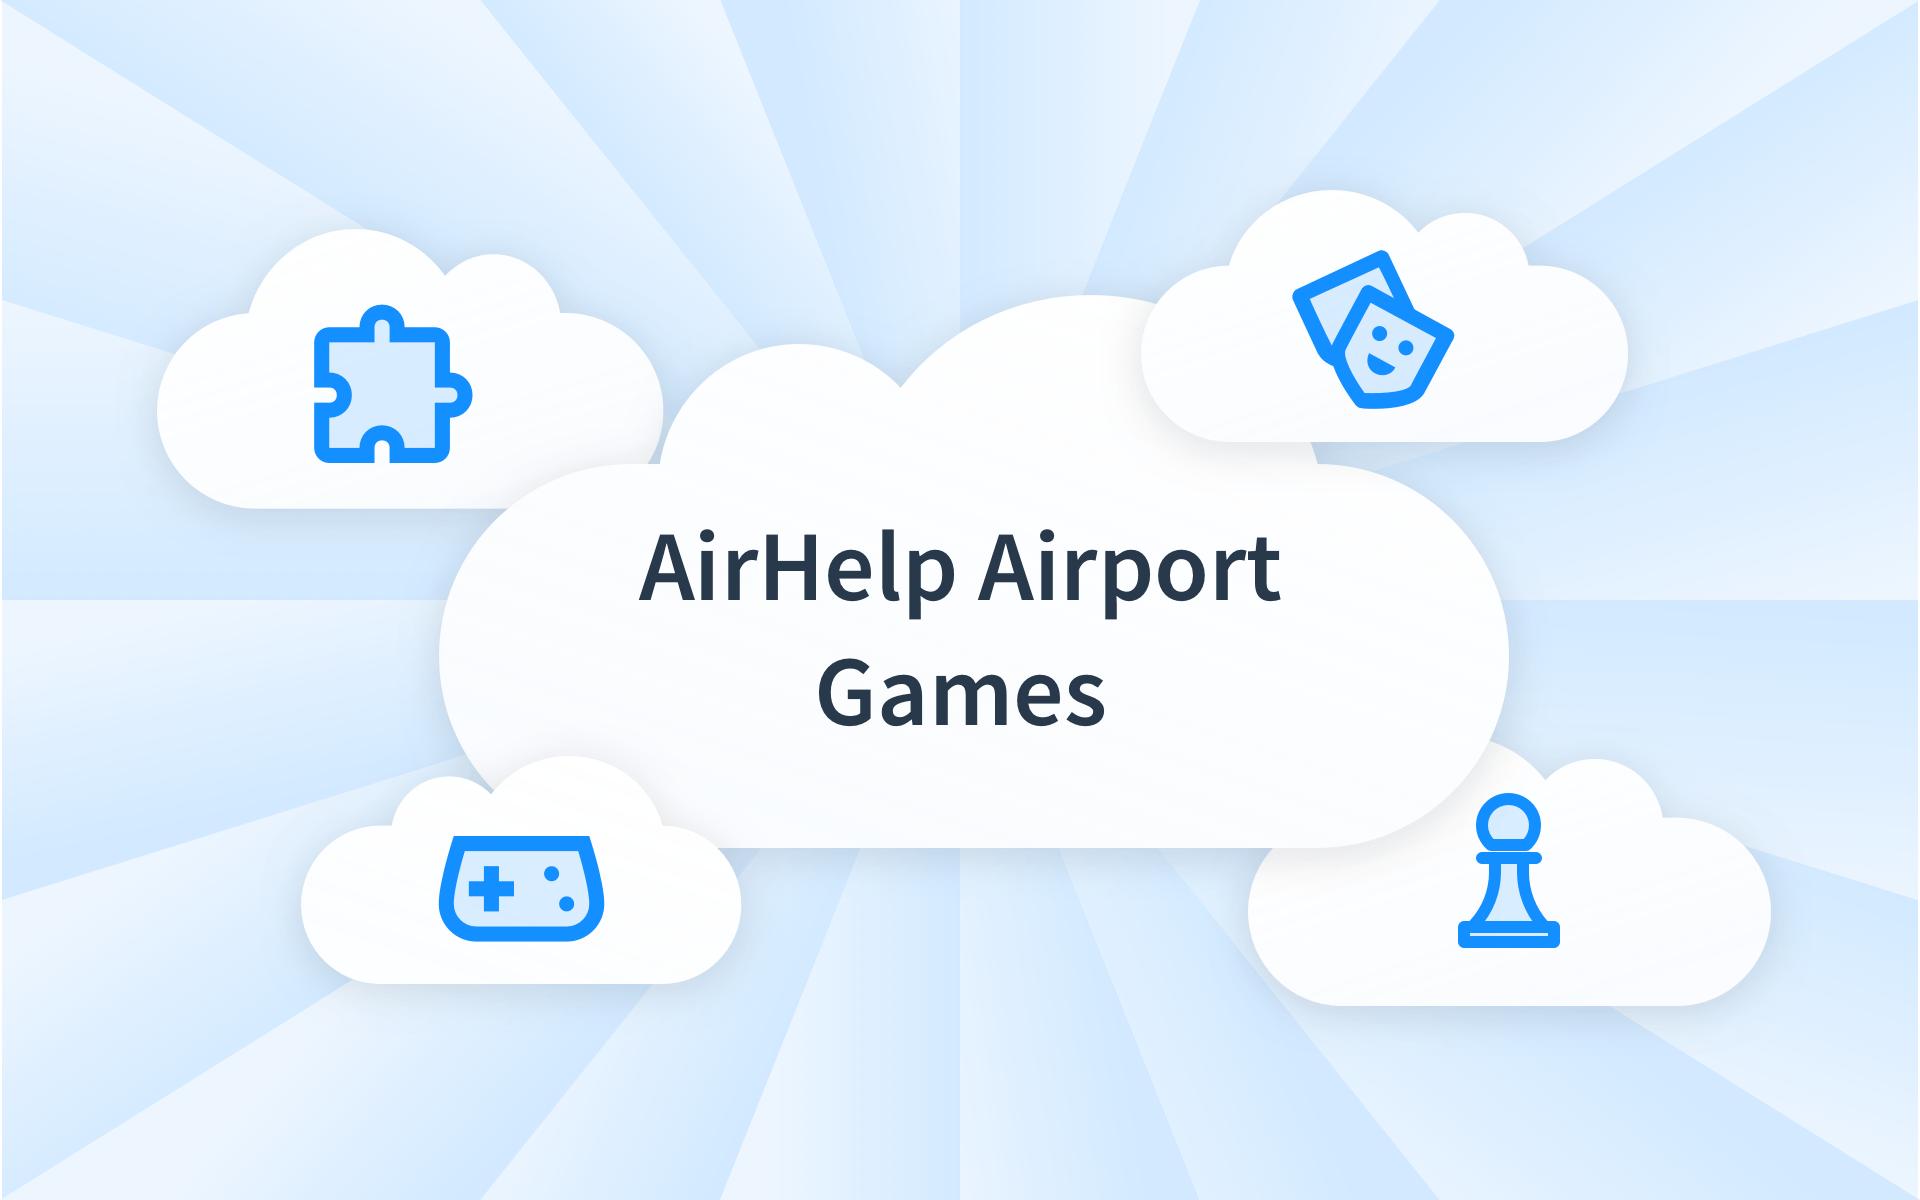 AirHelp Airport Games